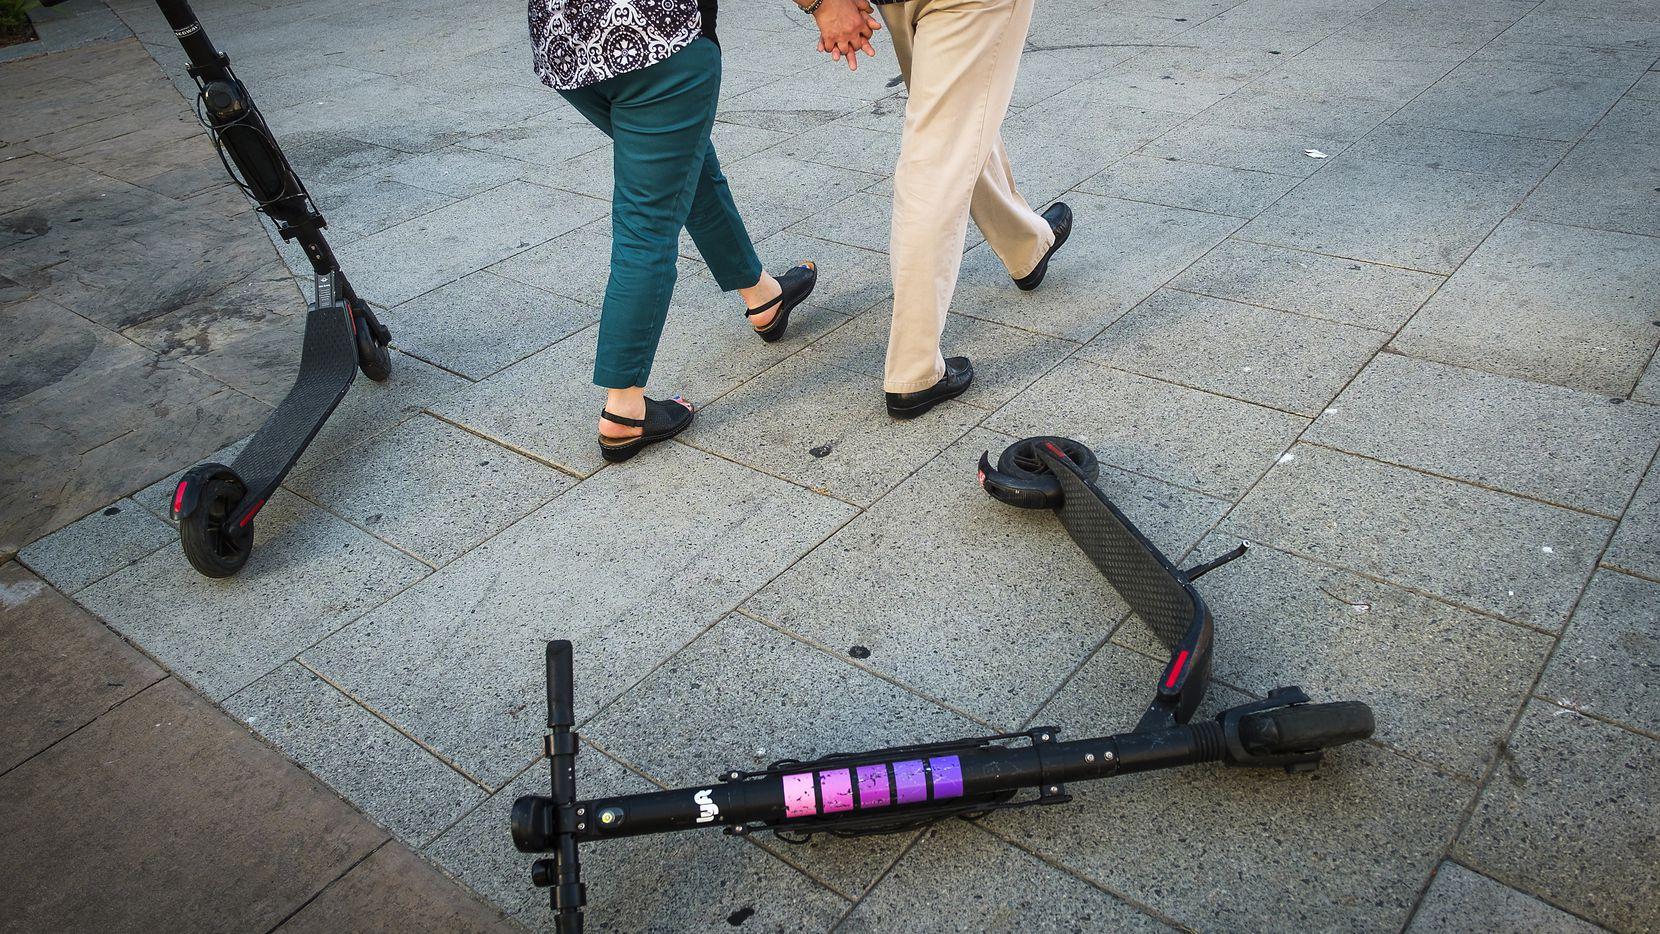 A Lyft scooter lies on a sidewalk along Commerce Street in downtown Dallas.